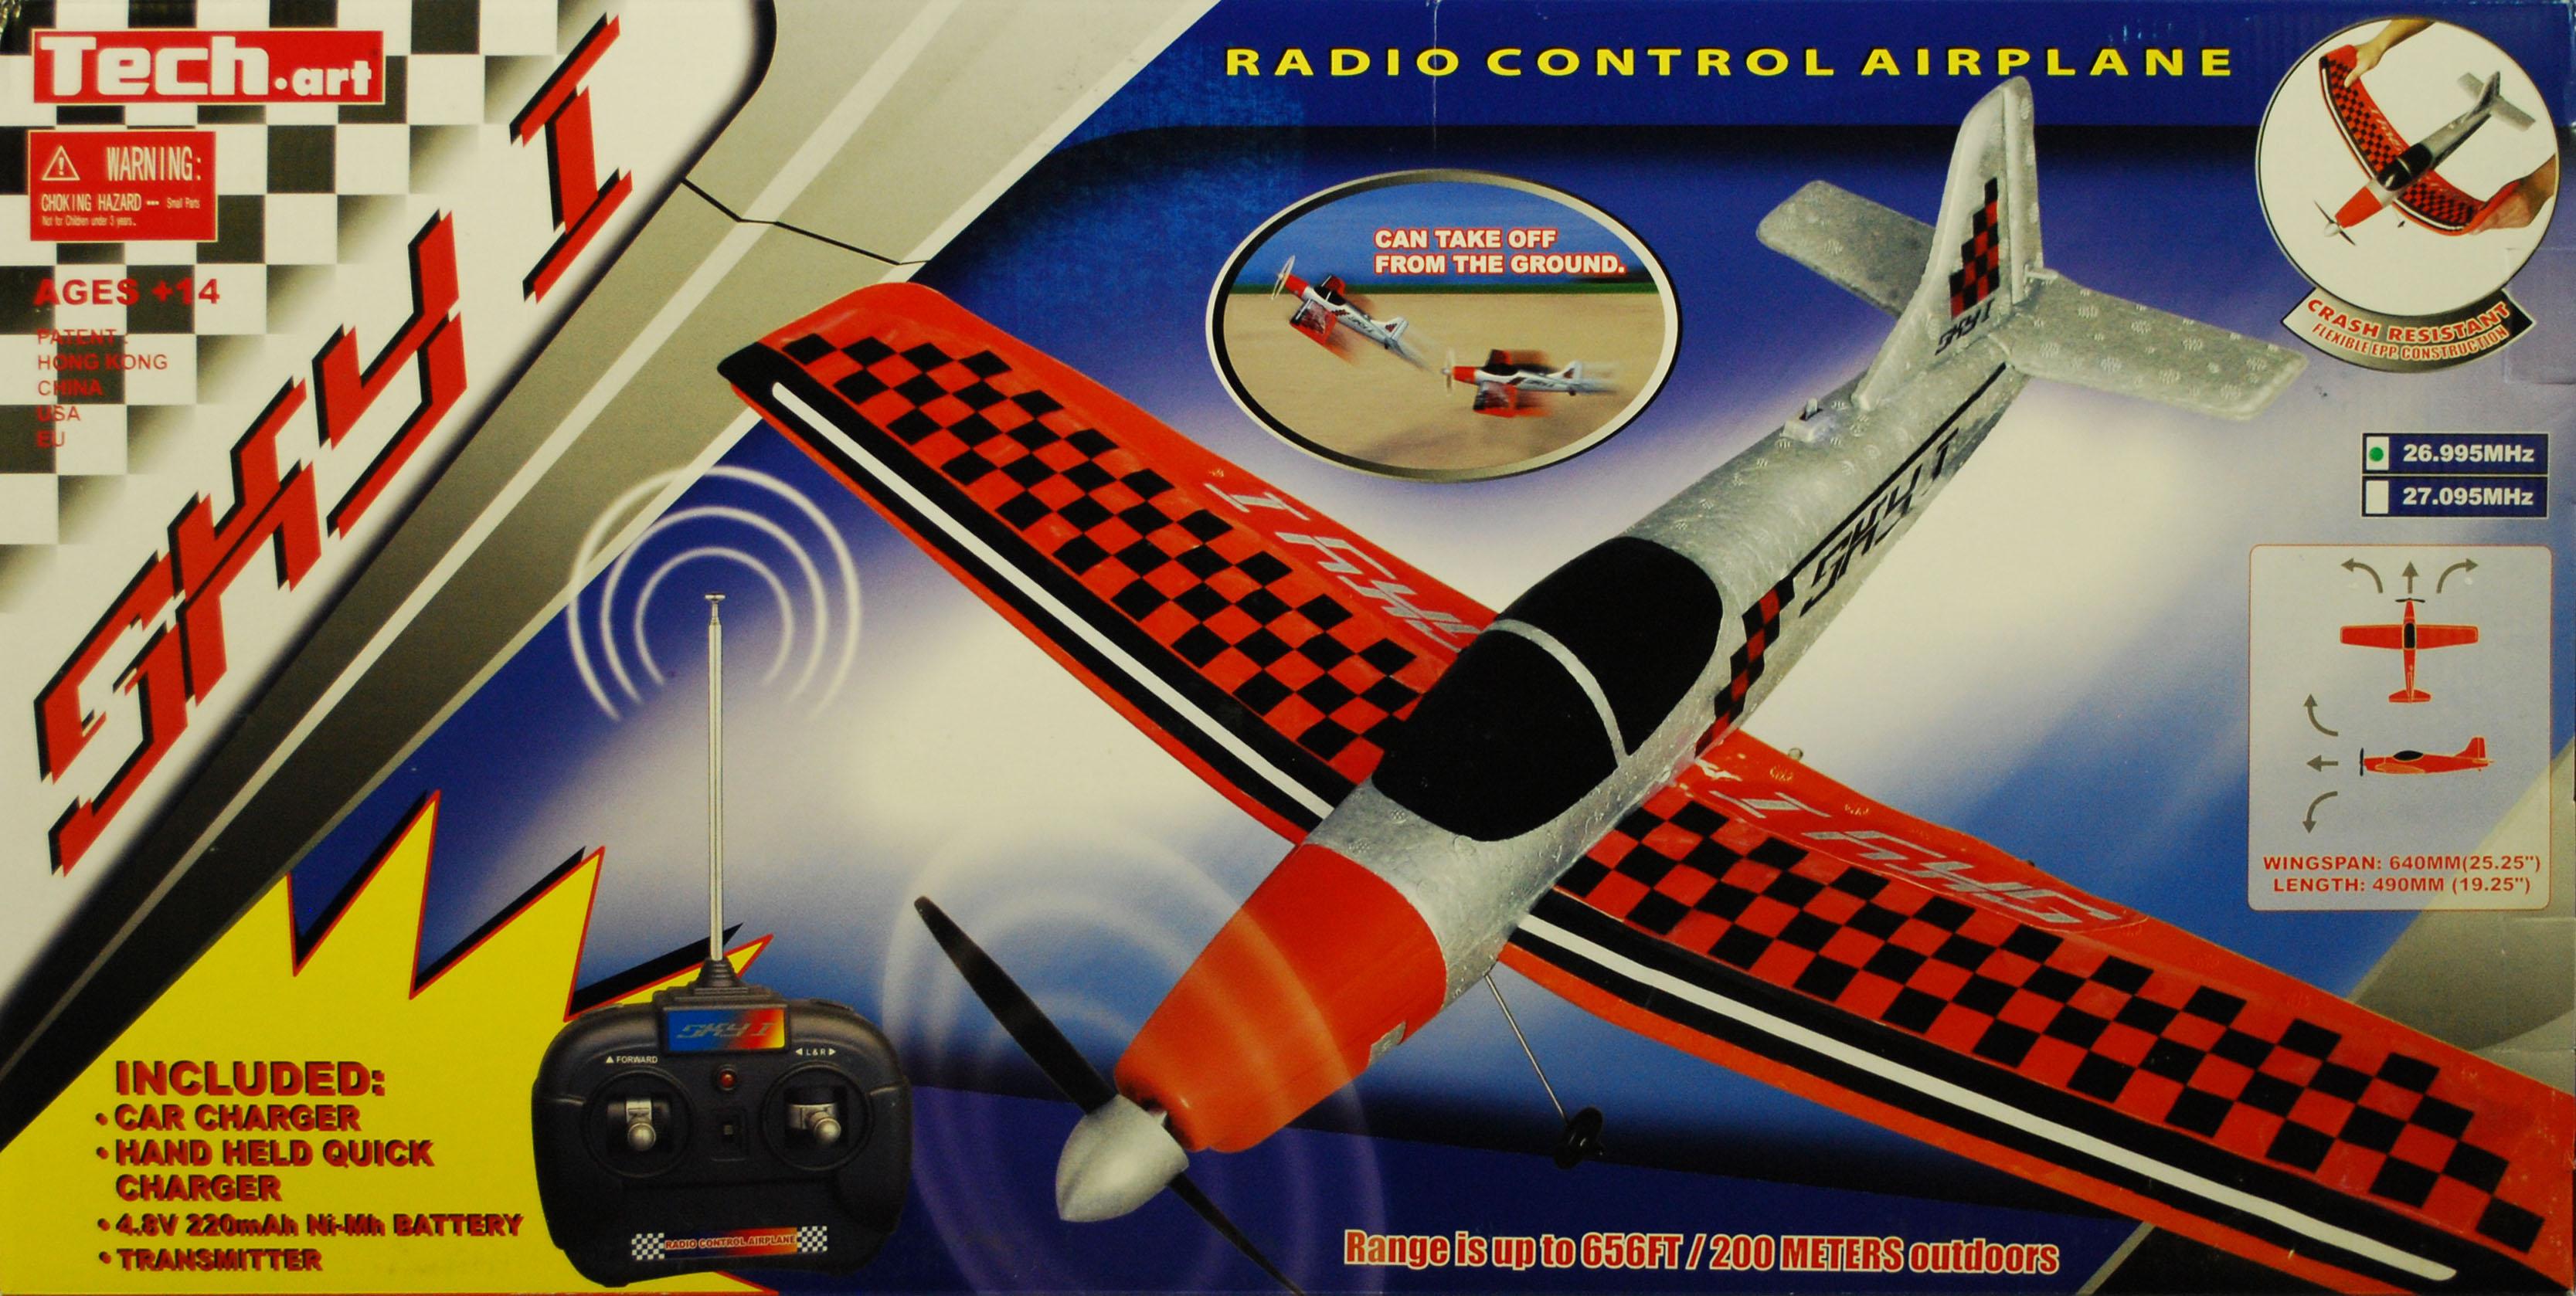 Golden Bright Radio Control Sky1 Airplane -Red PartNumber: 05240433000P KsnValue: 6357014 MfgPartNumber: 9803